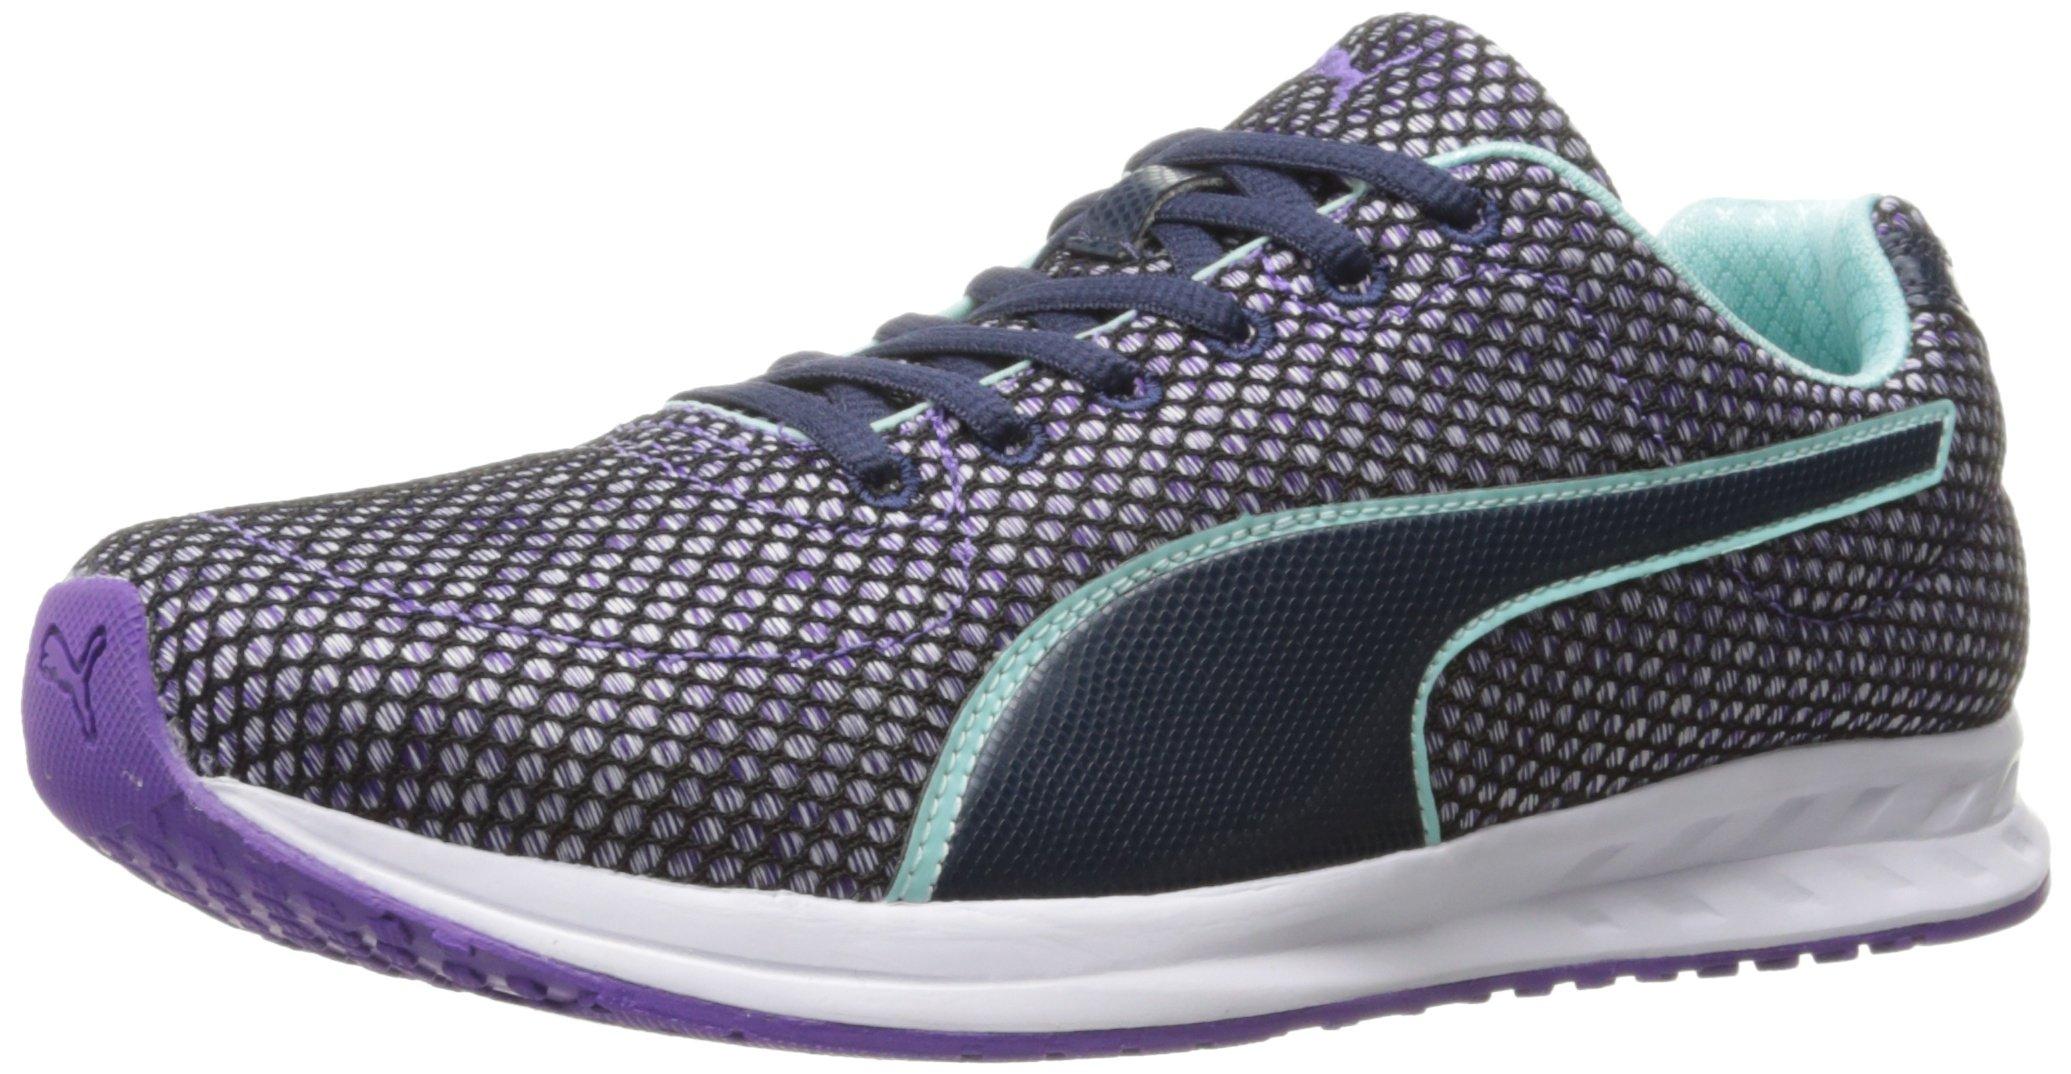 PUMA Women's Burst TECH WN's Cross-Trainer Shoe, Royal Purple-Aruba Blue-Peacoat, 9 M US